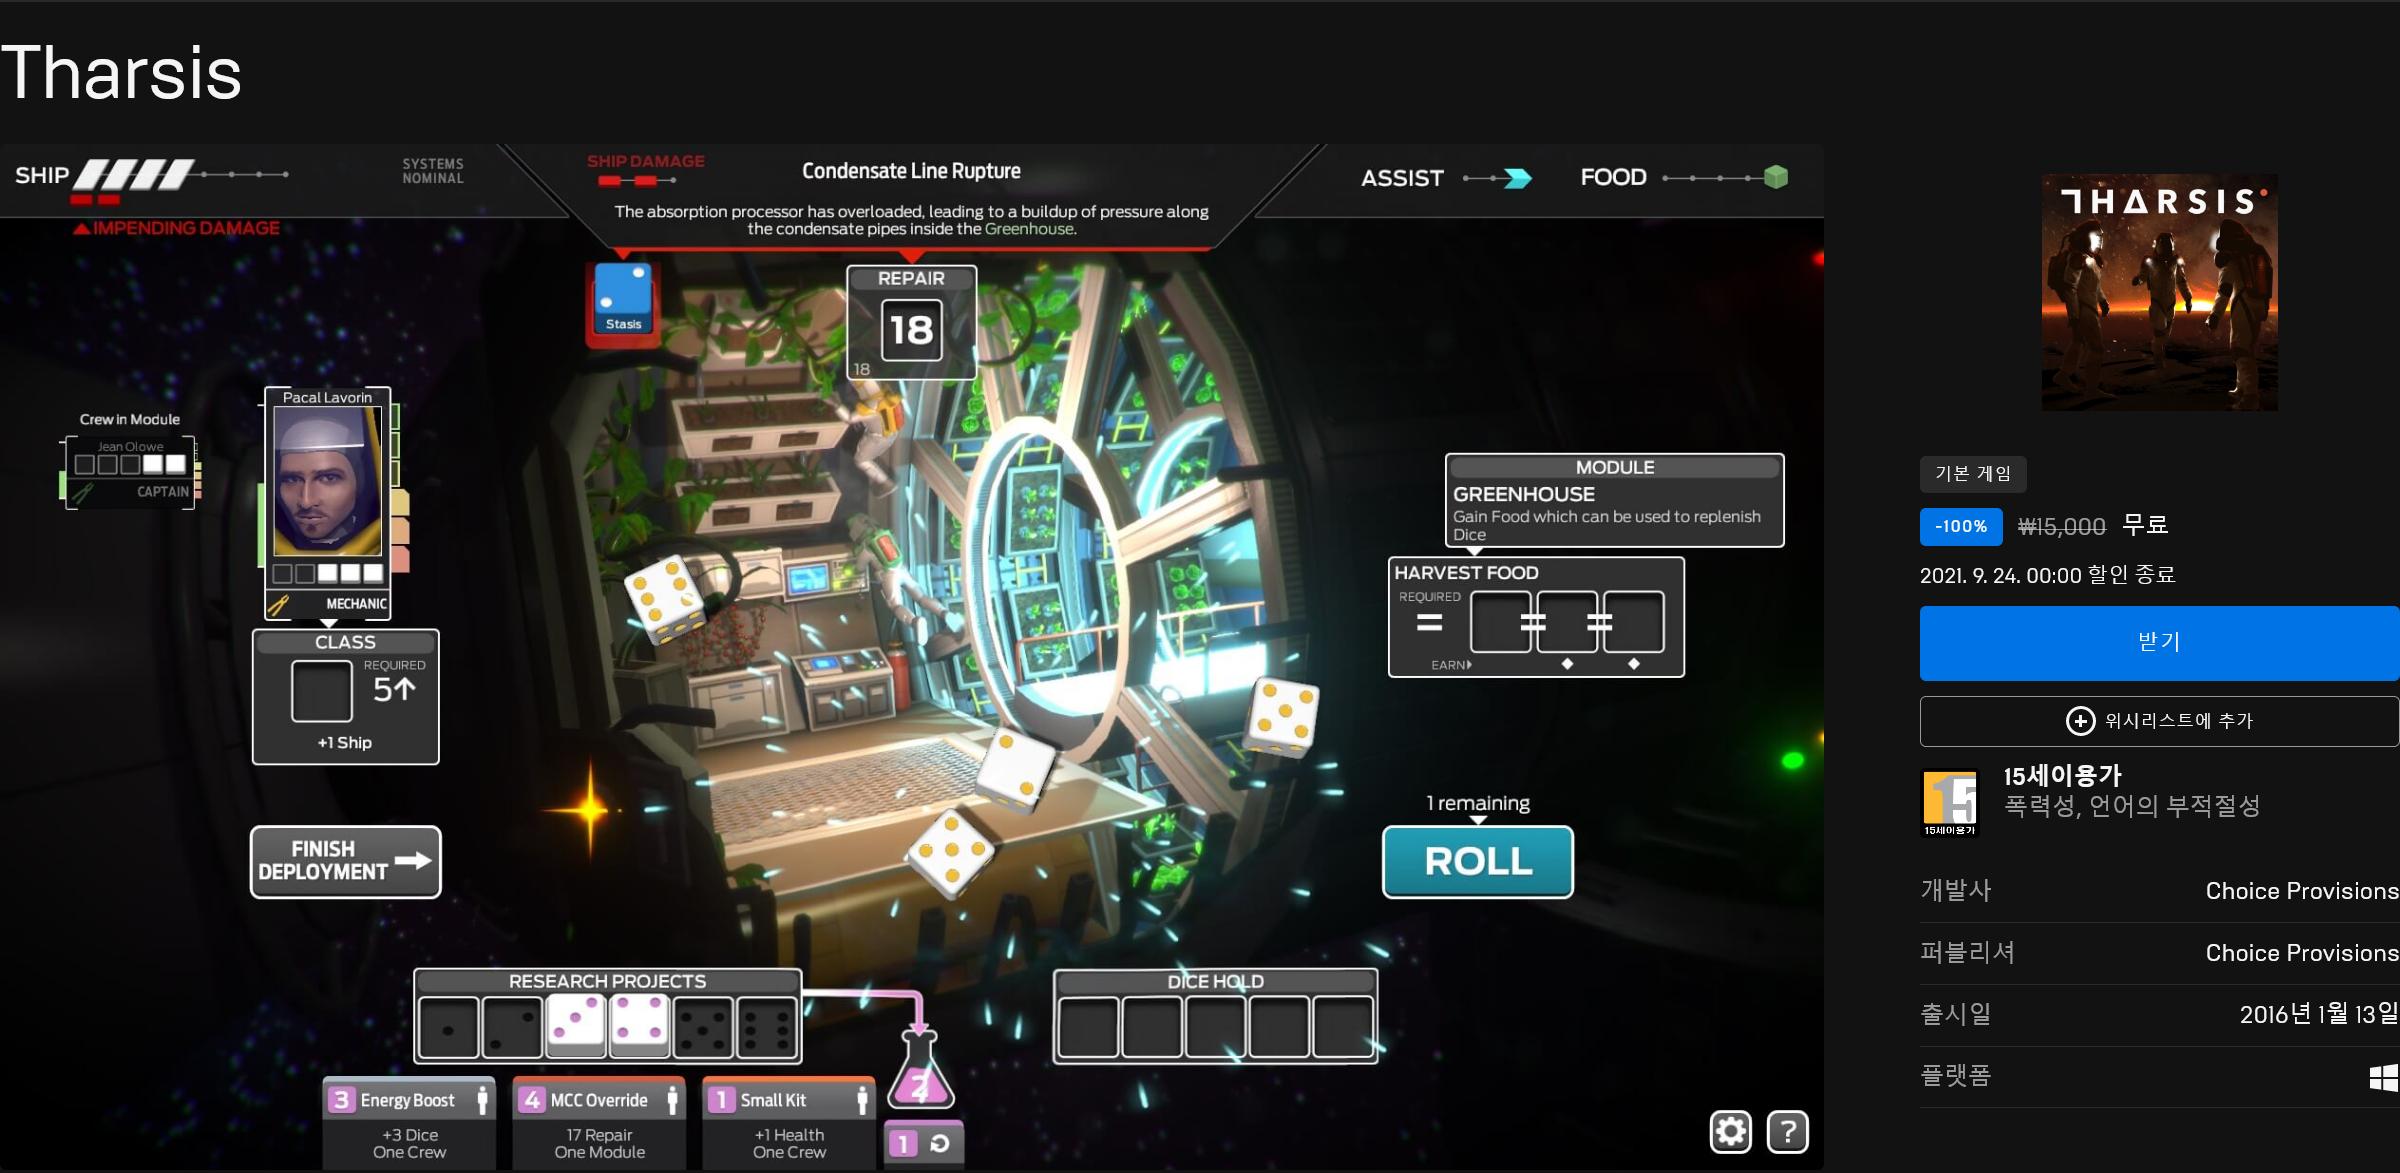 Screenshot 2021-09-17 at 00-22-45 Tharsis 오늘 다운로드 및 구매 - Epic Games Store.png